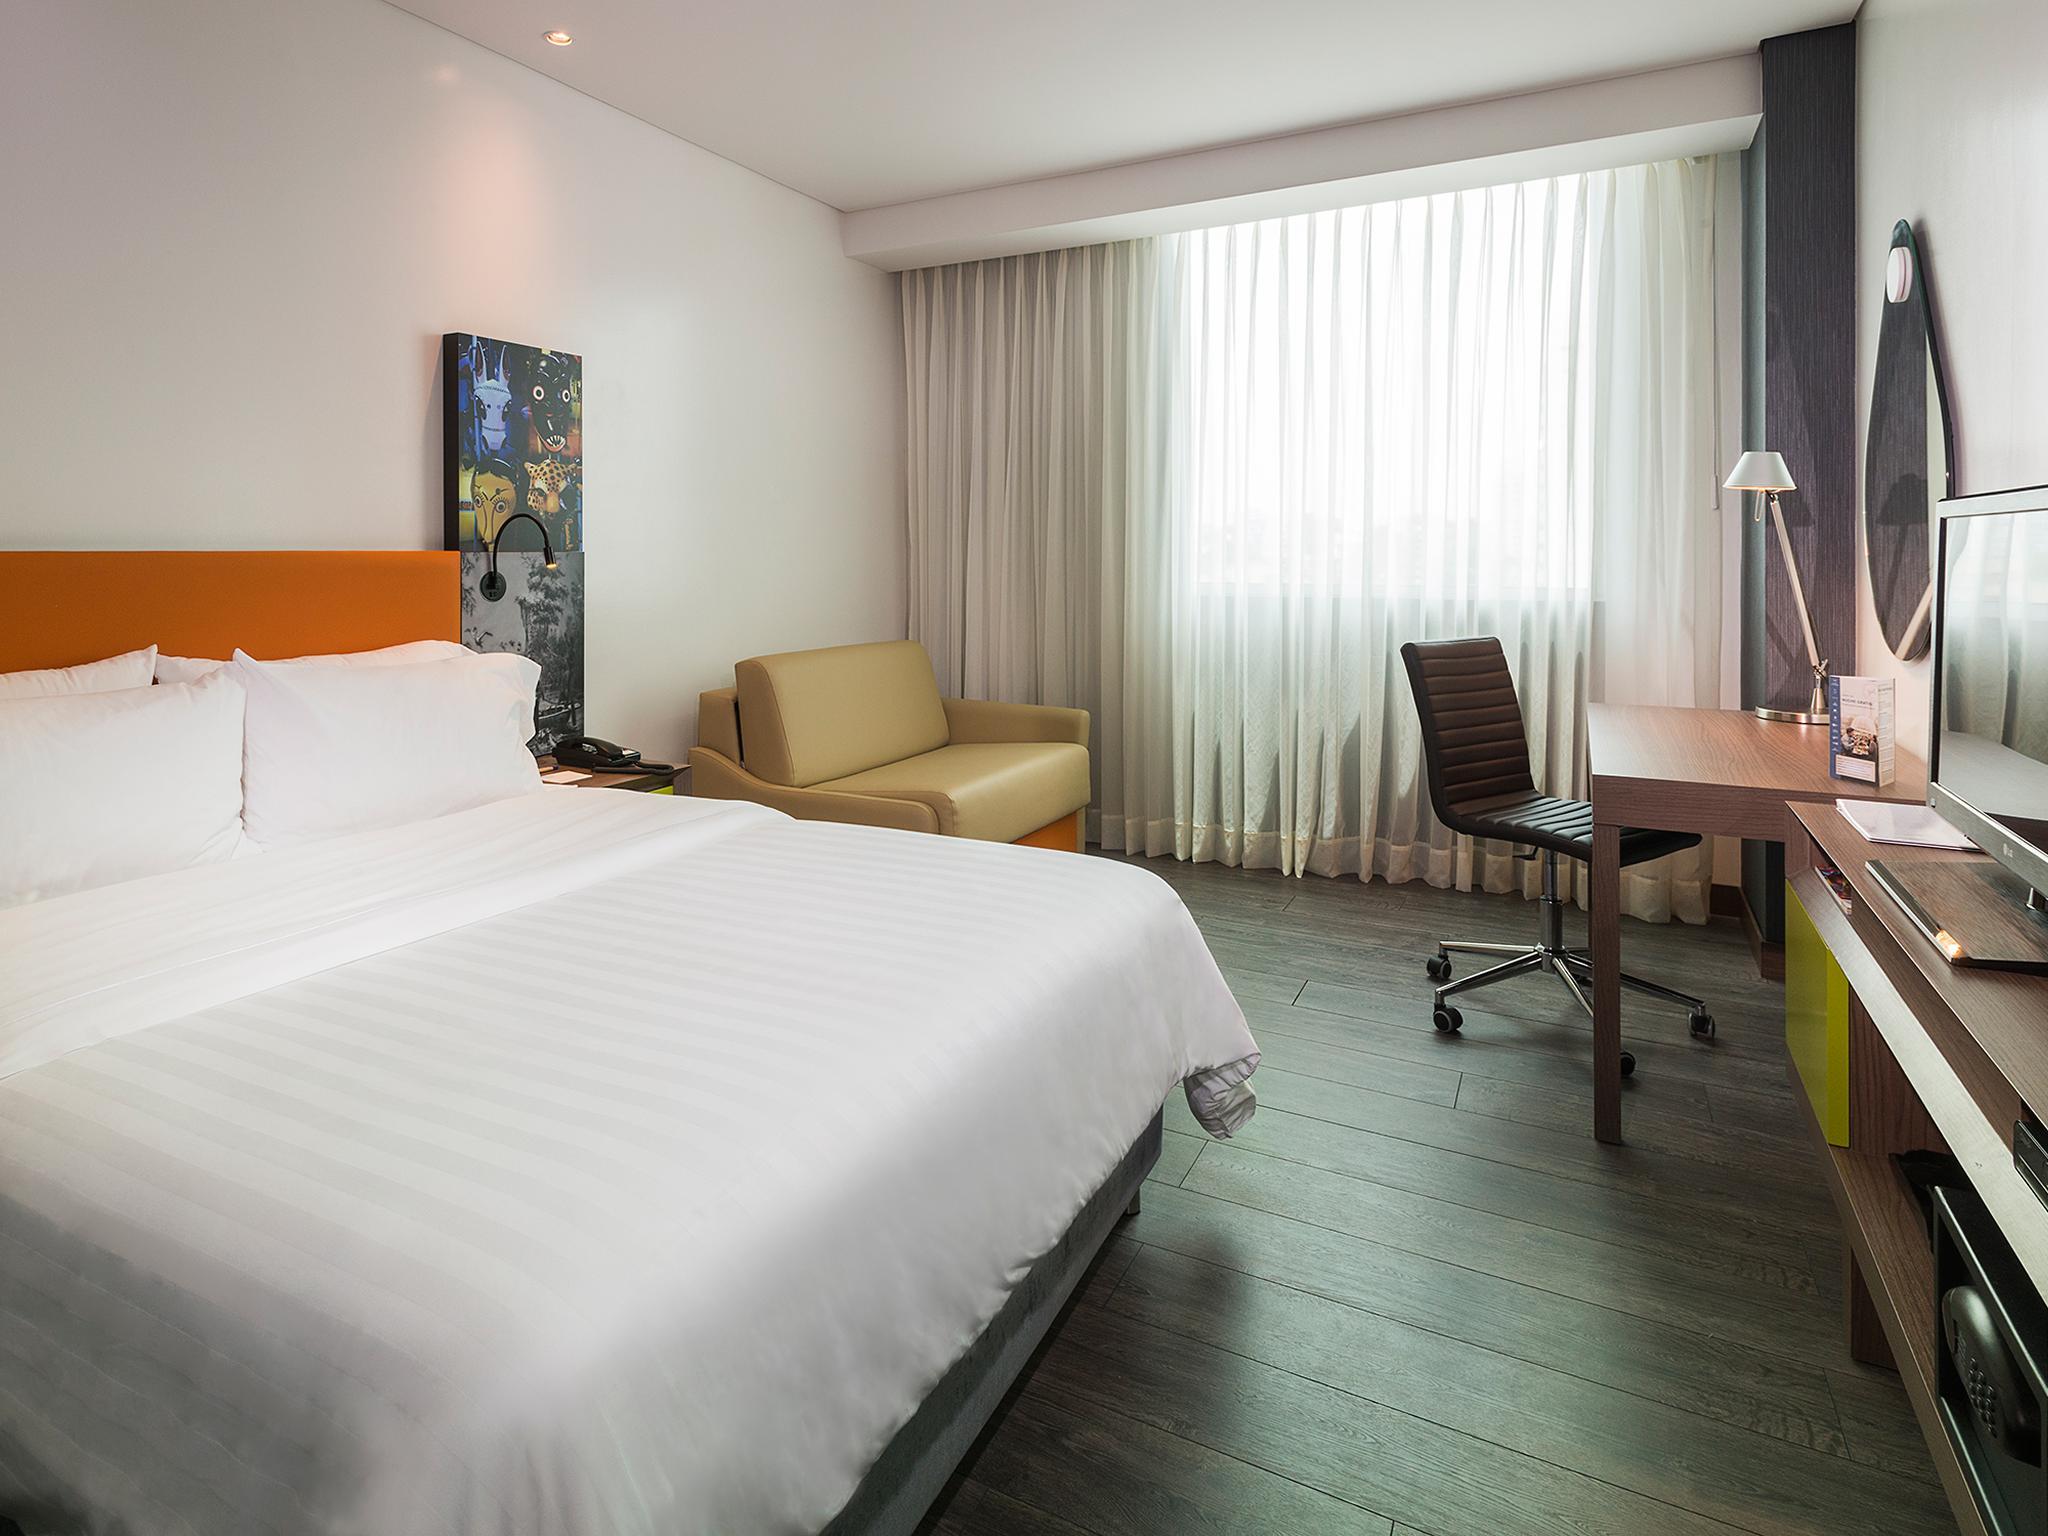 hampton by hilton clipsal double light switch wiring diagram hoteles en colombia barranquilla y